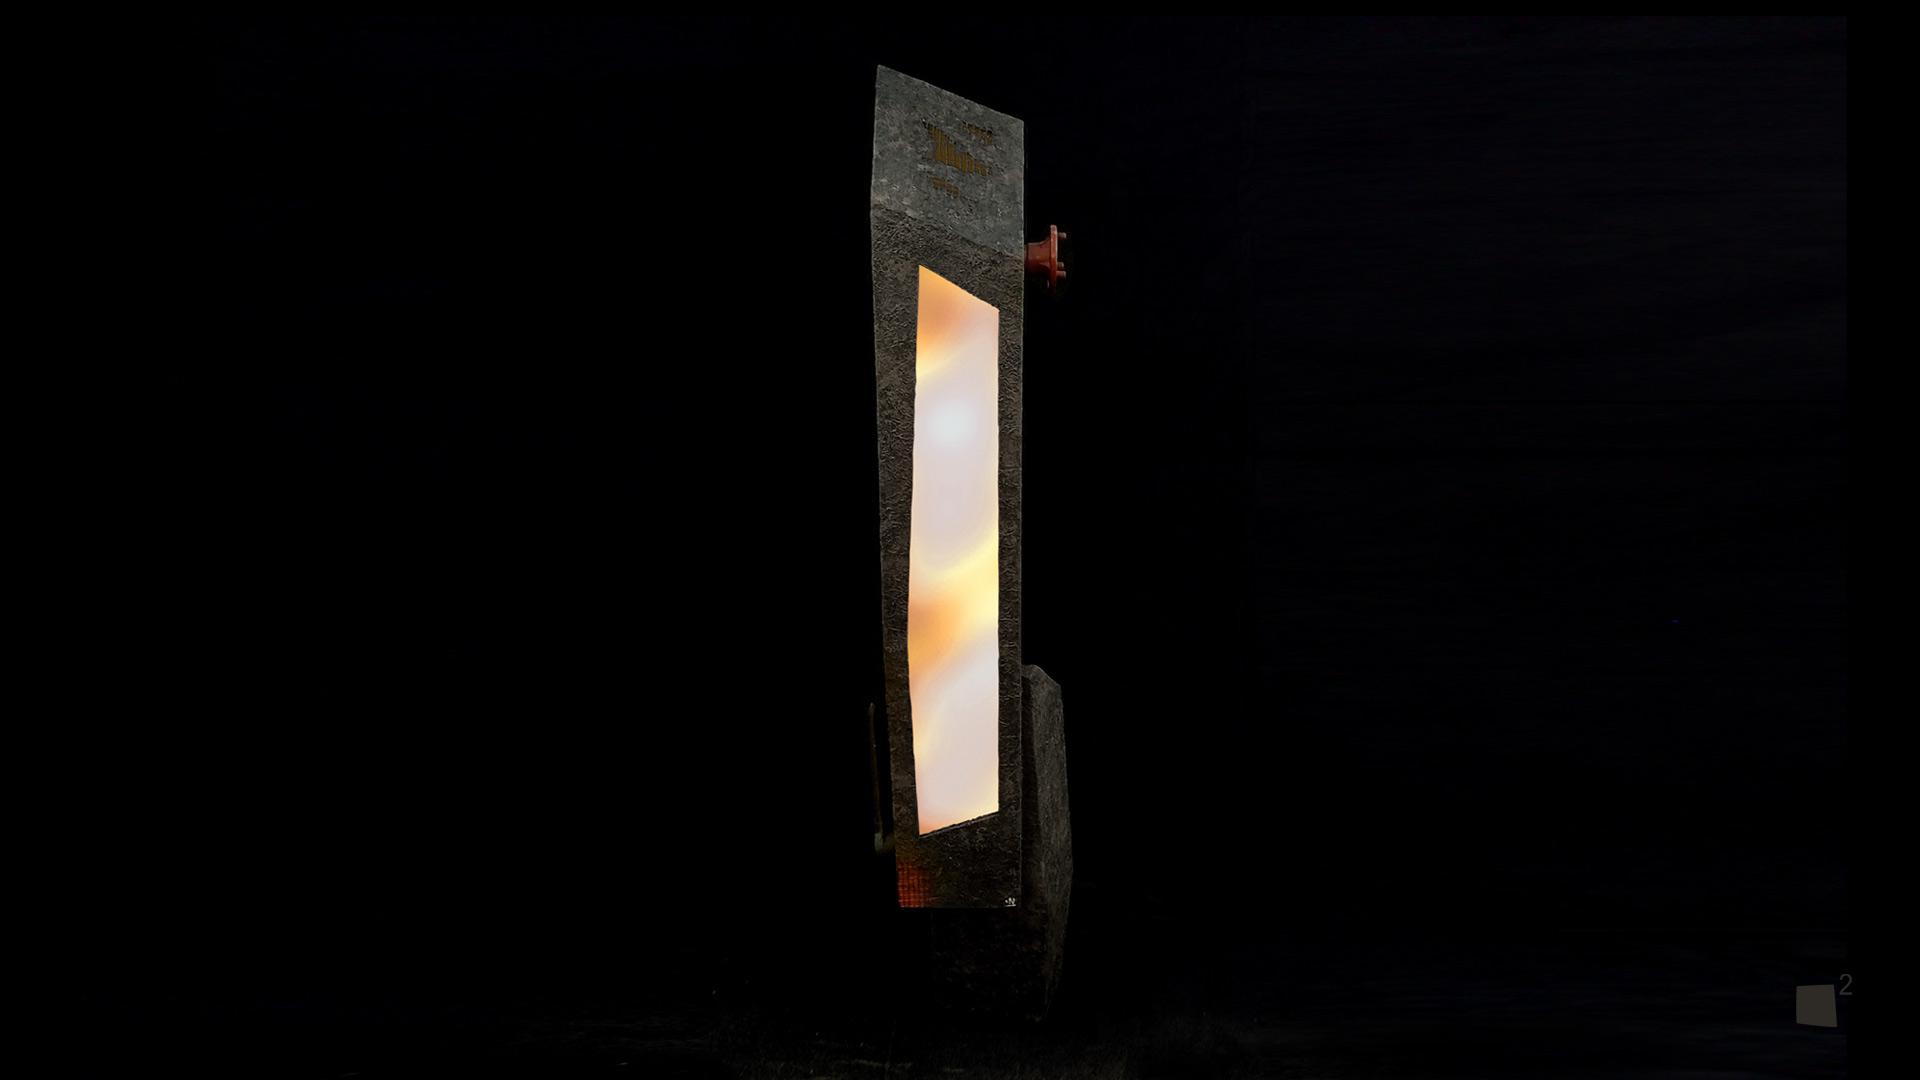 Schwerlichtkrümmer - Torina van 0D0 - Floor Lamp - Weibach2